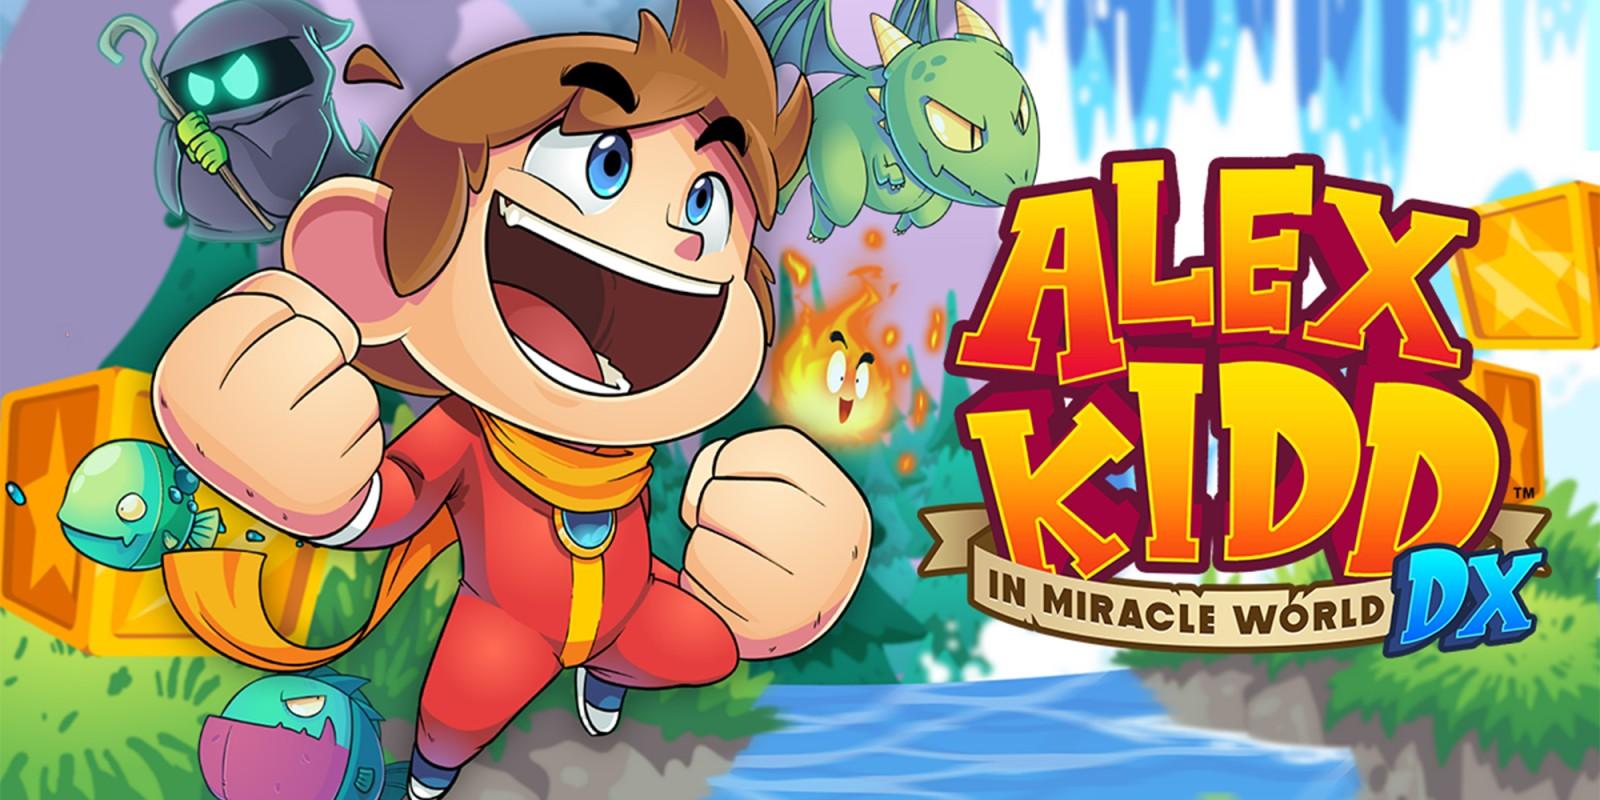 Alex Kidd in Miracle World DX | Nintendo Switch | Jeux | Nintendo